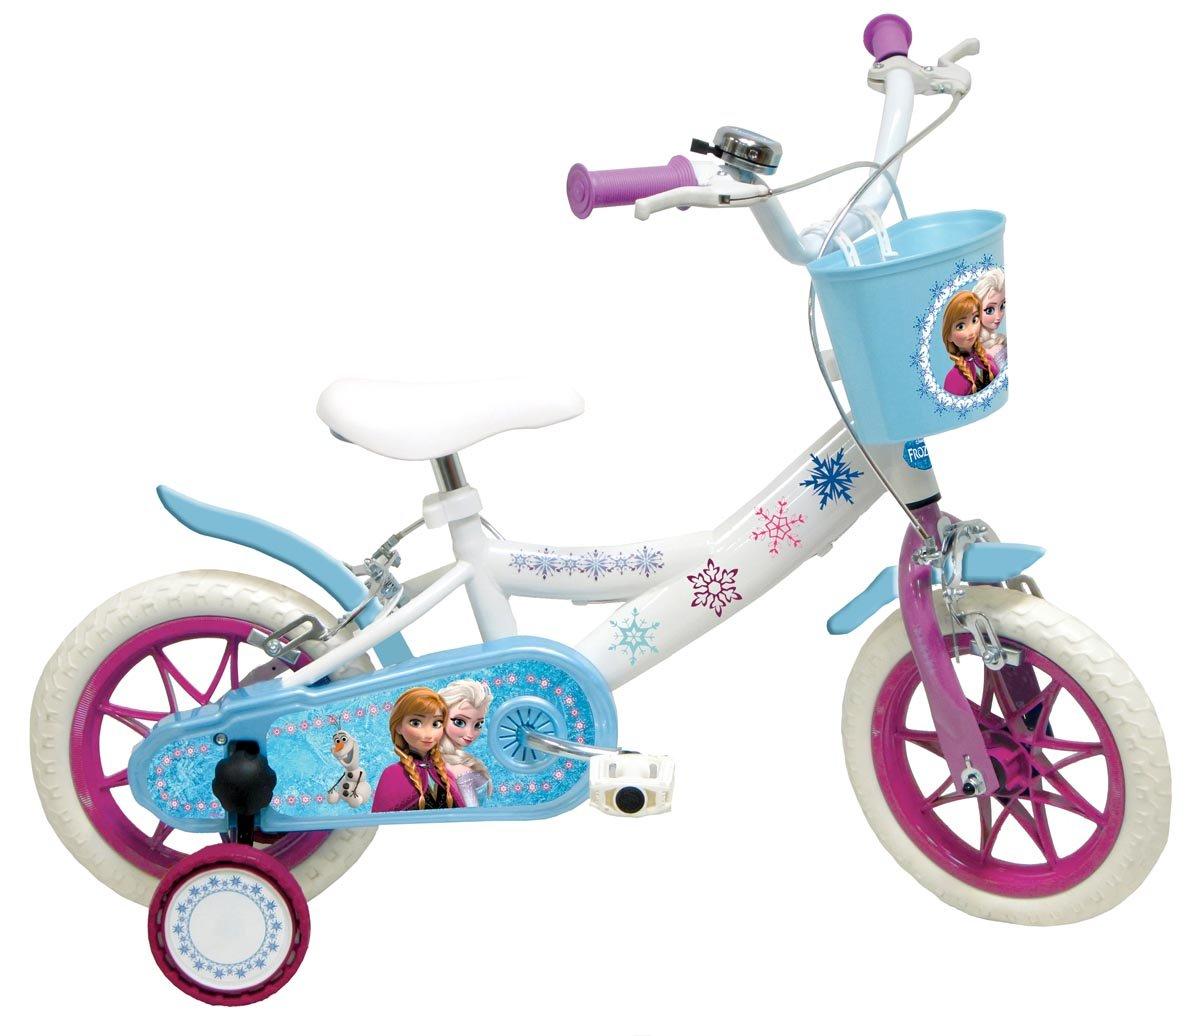 Mondo 25280.0 Fahrrad, Motiv: Die Eiskönigin, 25,4cm (10Zoll)